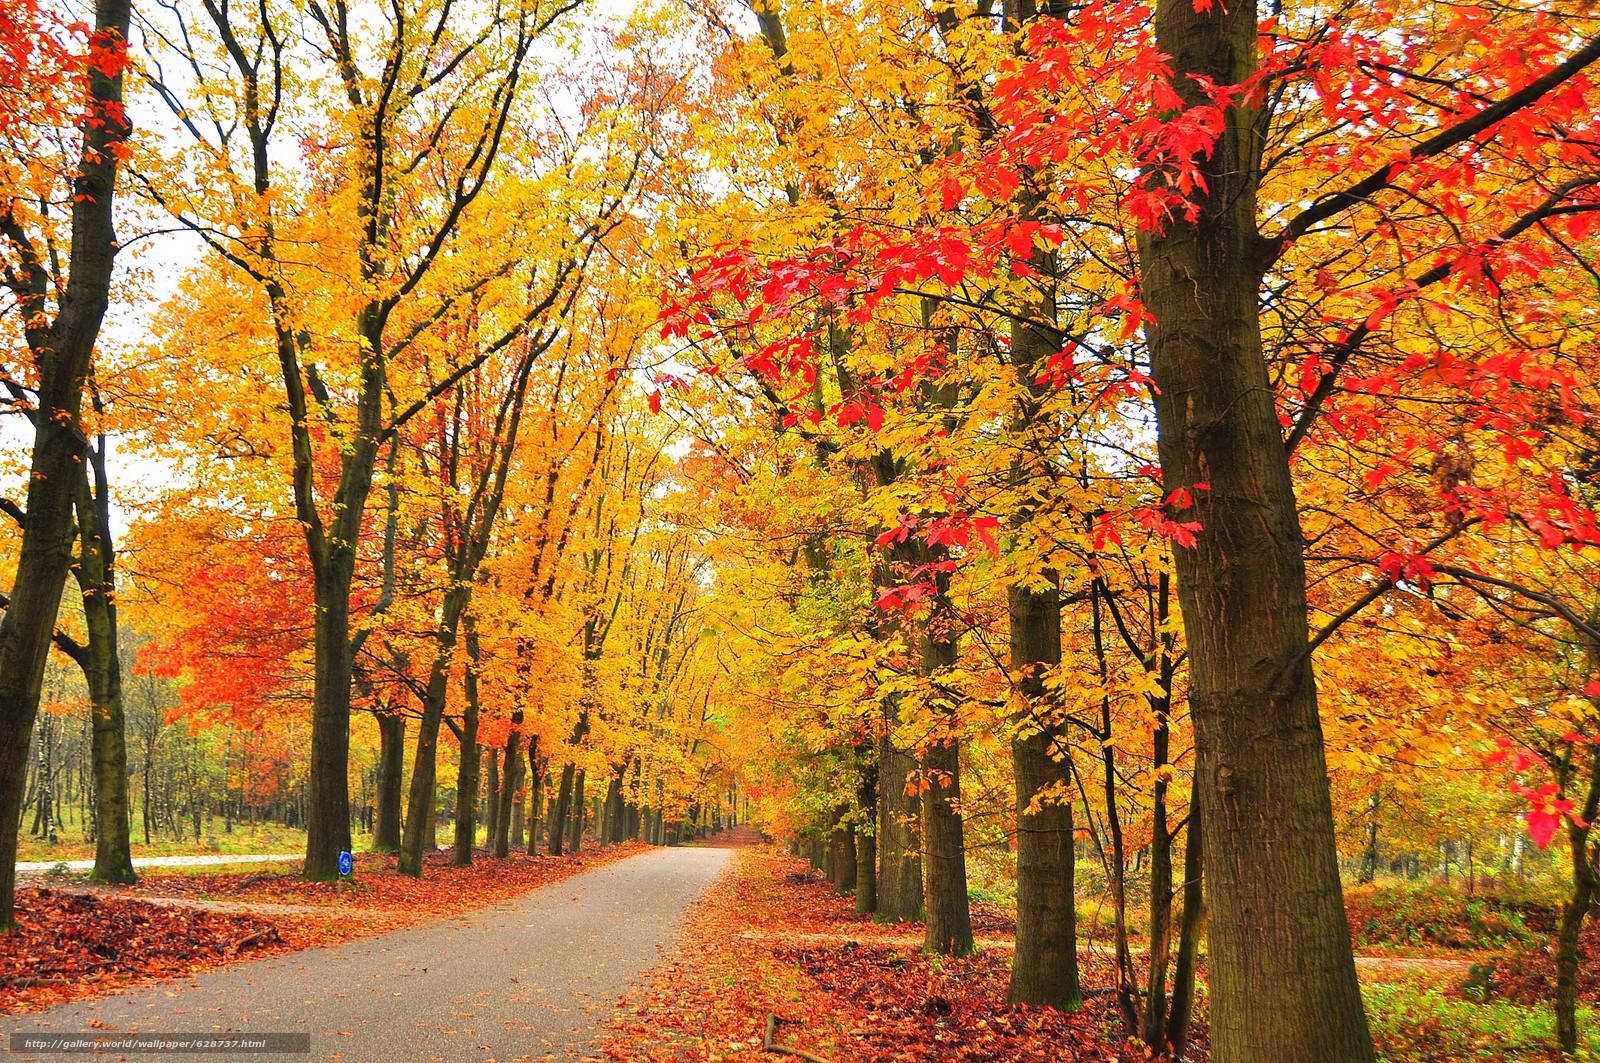 осень, парк, дорога, деревья, пейзаж